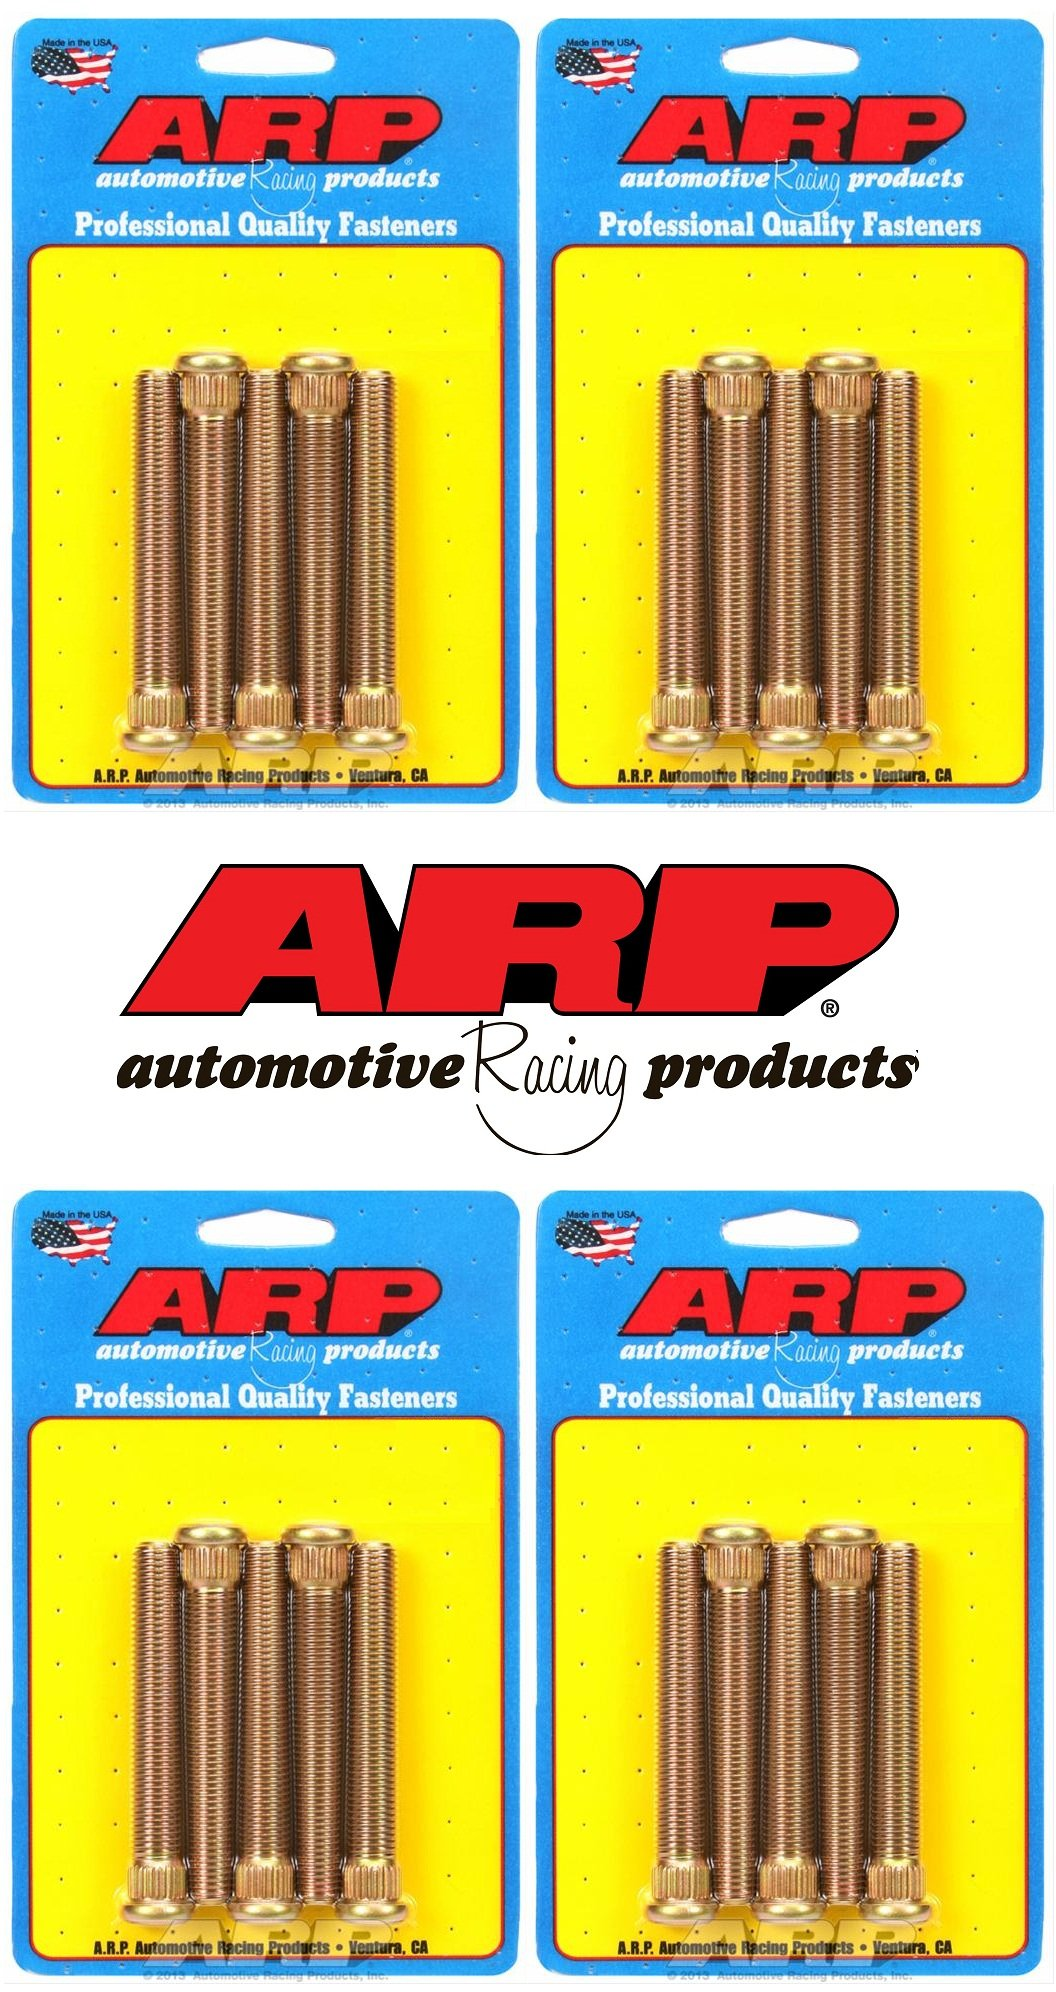 "ARP Wheel Stud Kit For Late GM & Camaro, M12 X 1.50"" - 3.250˝ UHL (Set of 20)"